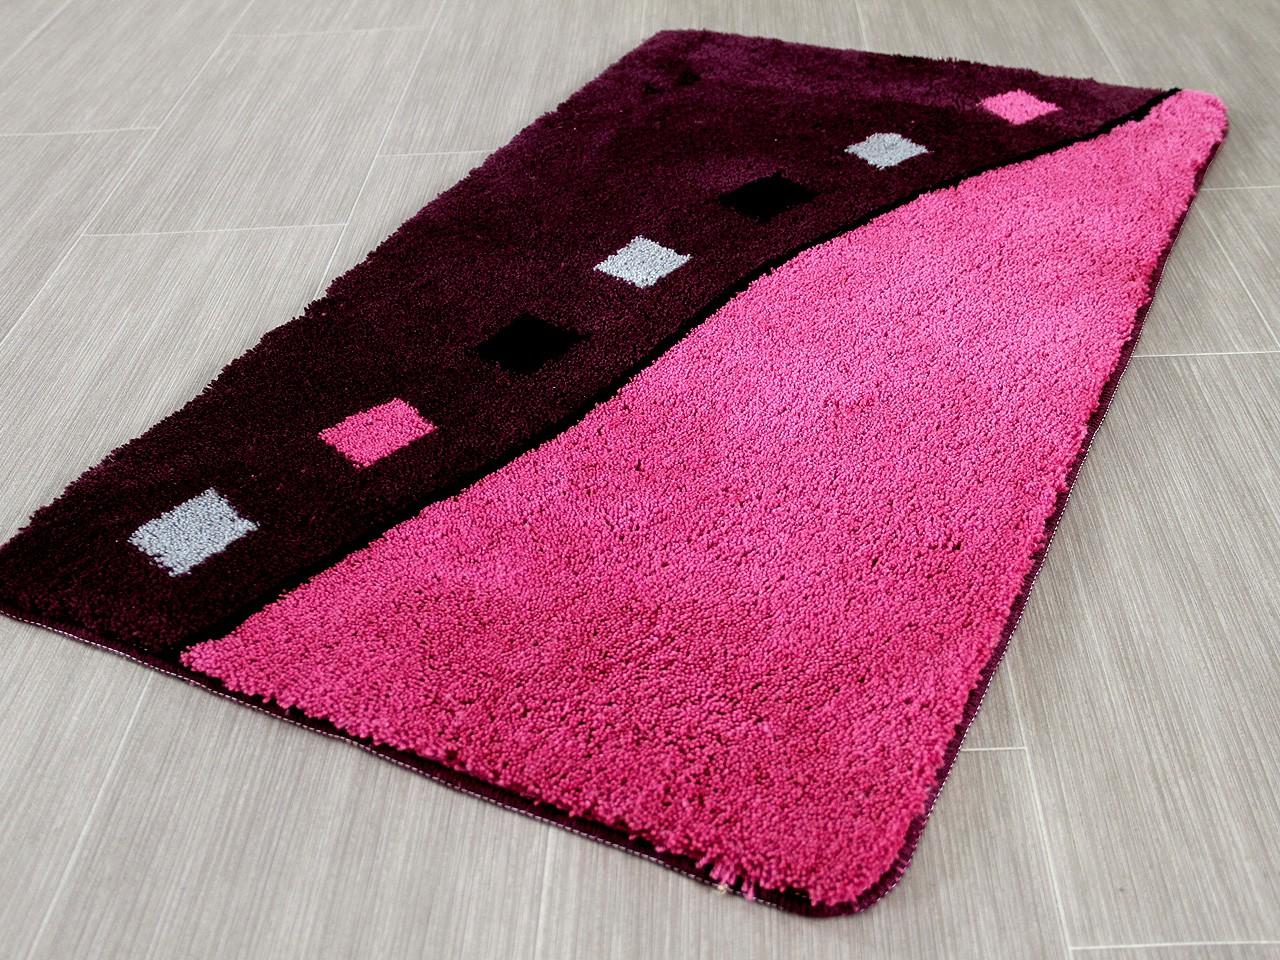 pacific badteppich rhodos purple rosa in 5 gr en badteppiche pacific badteppiche. Black Bedroom Furniture Sets. Home Design Ideas